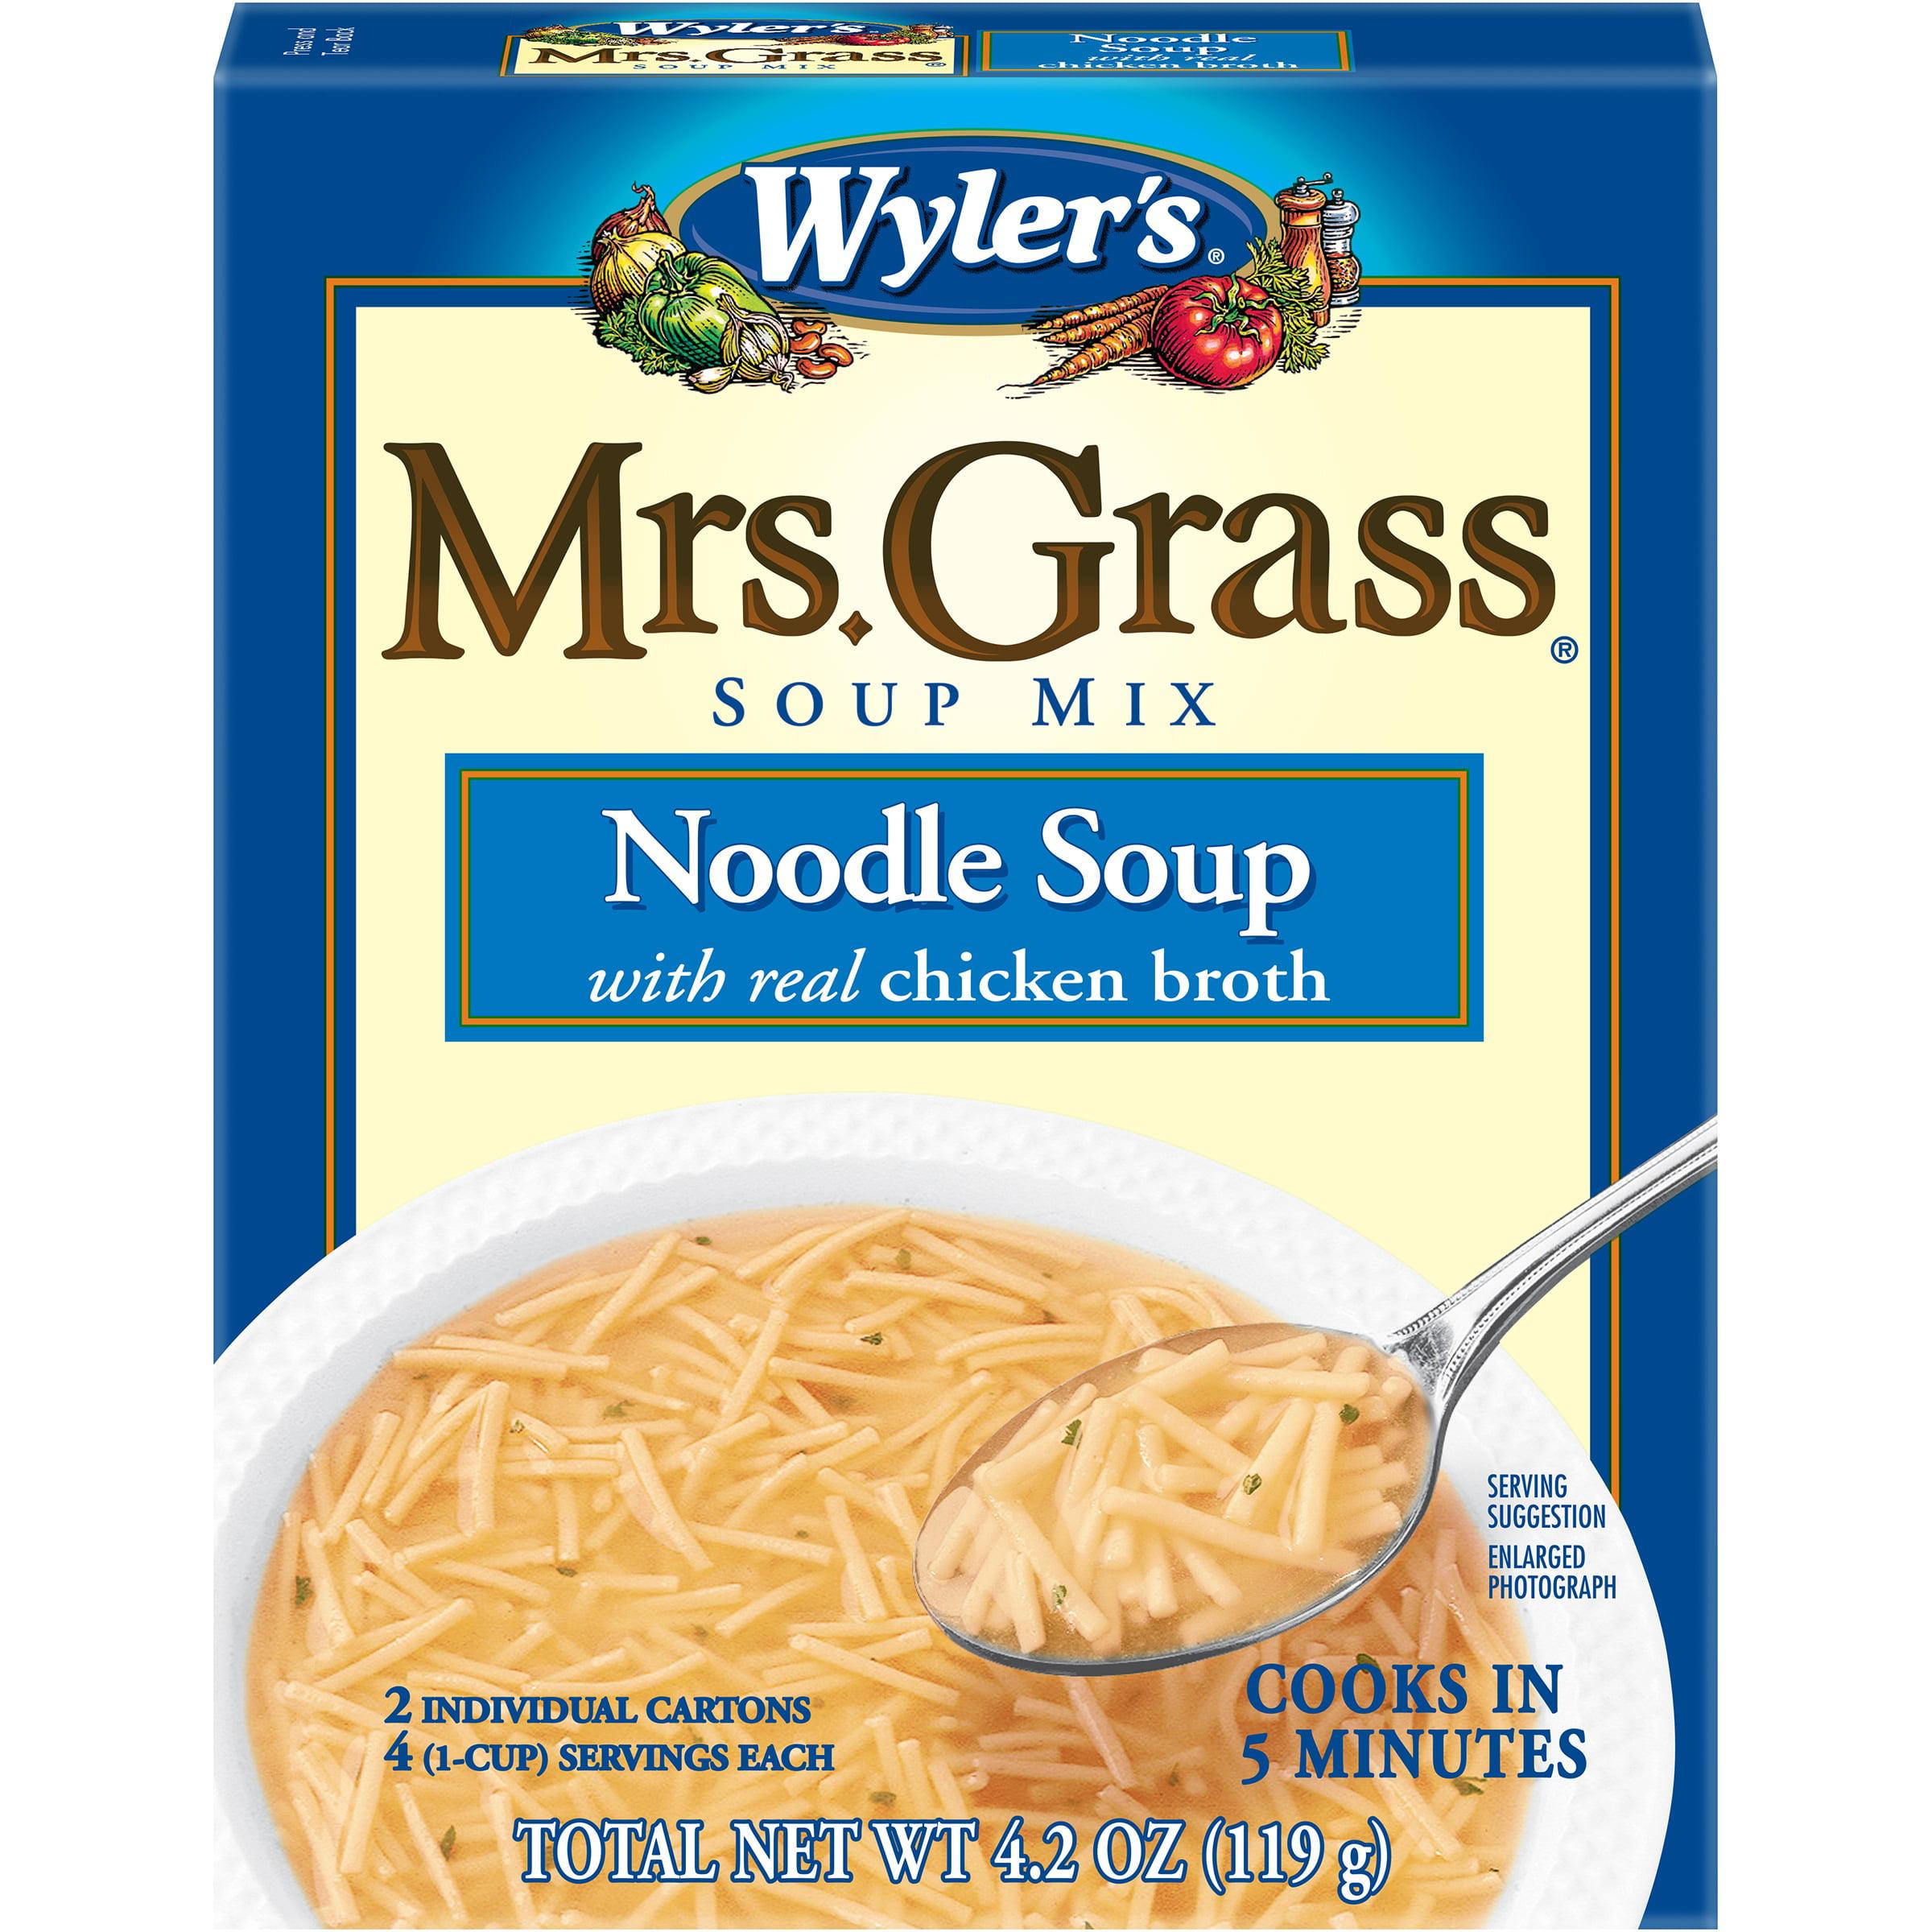 Wyler's Mrs. Grass Noodle Soup Mix 4.2 oz. Box